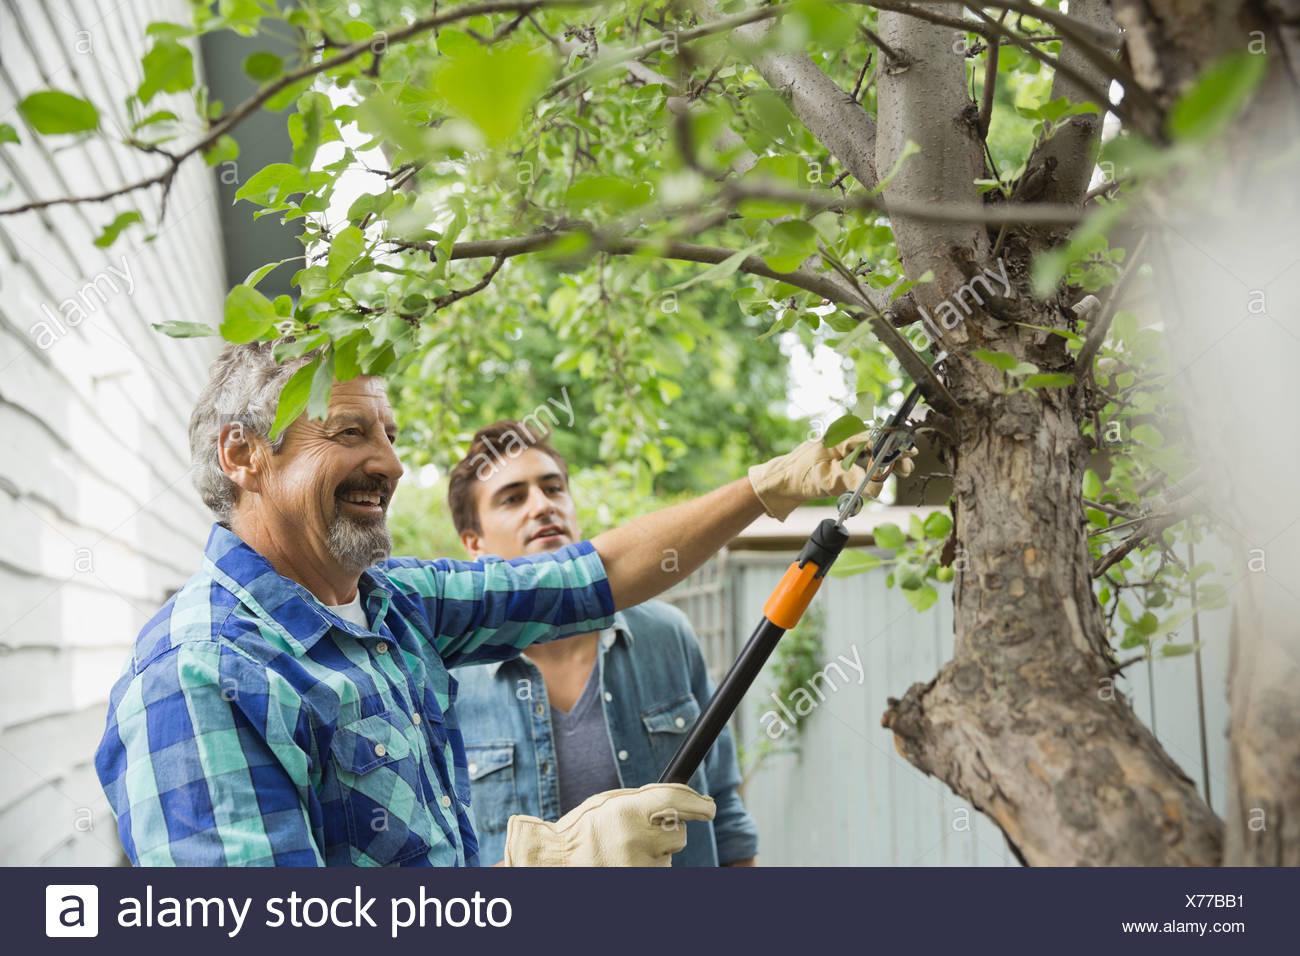 Tree Cutting Stock Photos & Tree Cutting Stock Images - Alamy